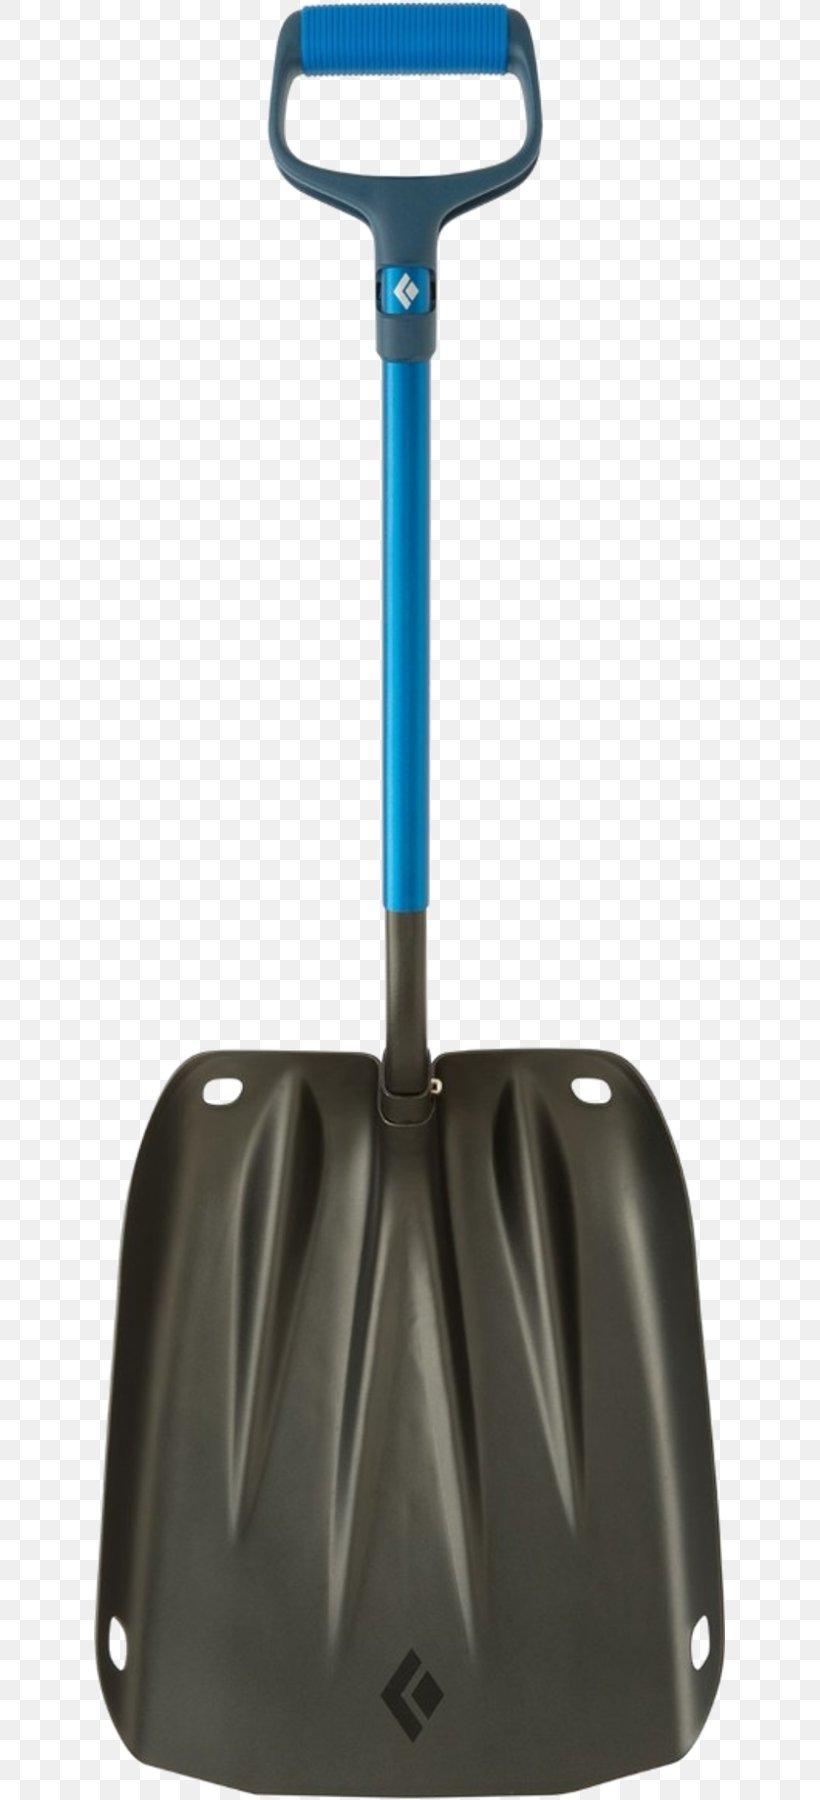 Black Diamond Equipment Backcountry Skiing Snow Shovel, PNG, 631x1800px, Black Diamond Equipment, Backcountry Skiing, Backcountrycom, Backpack, Digging Download Free